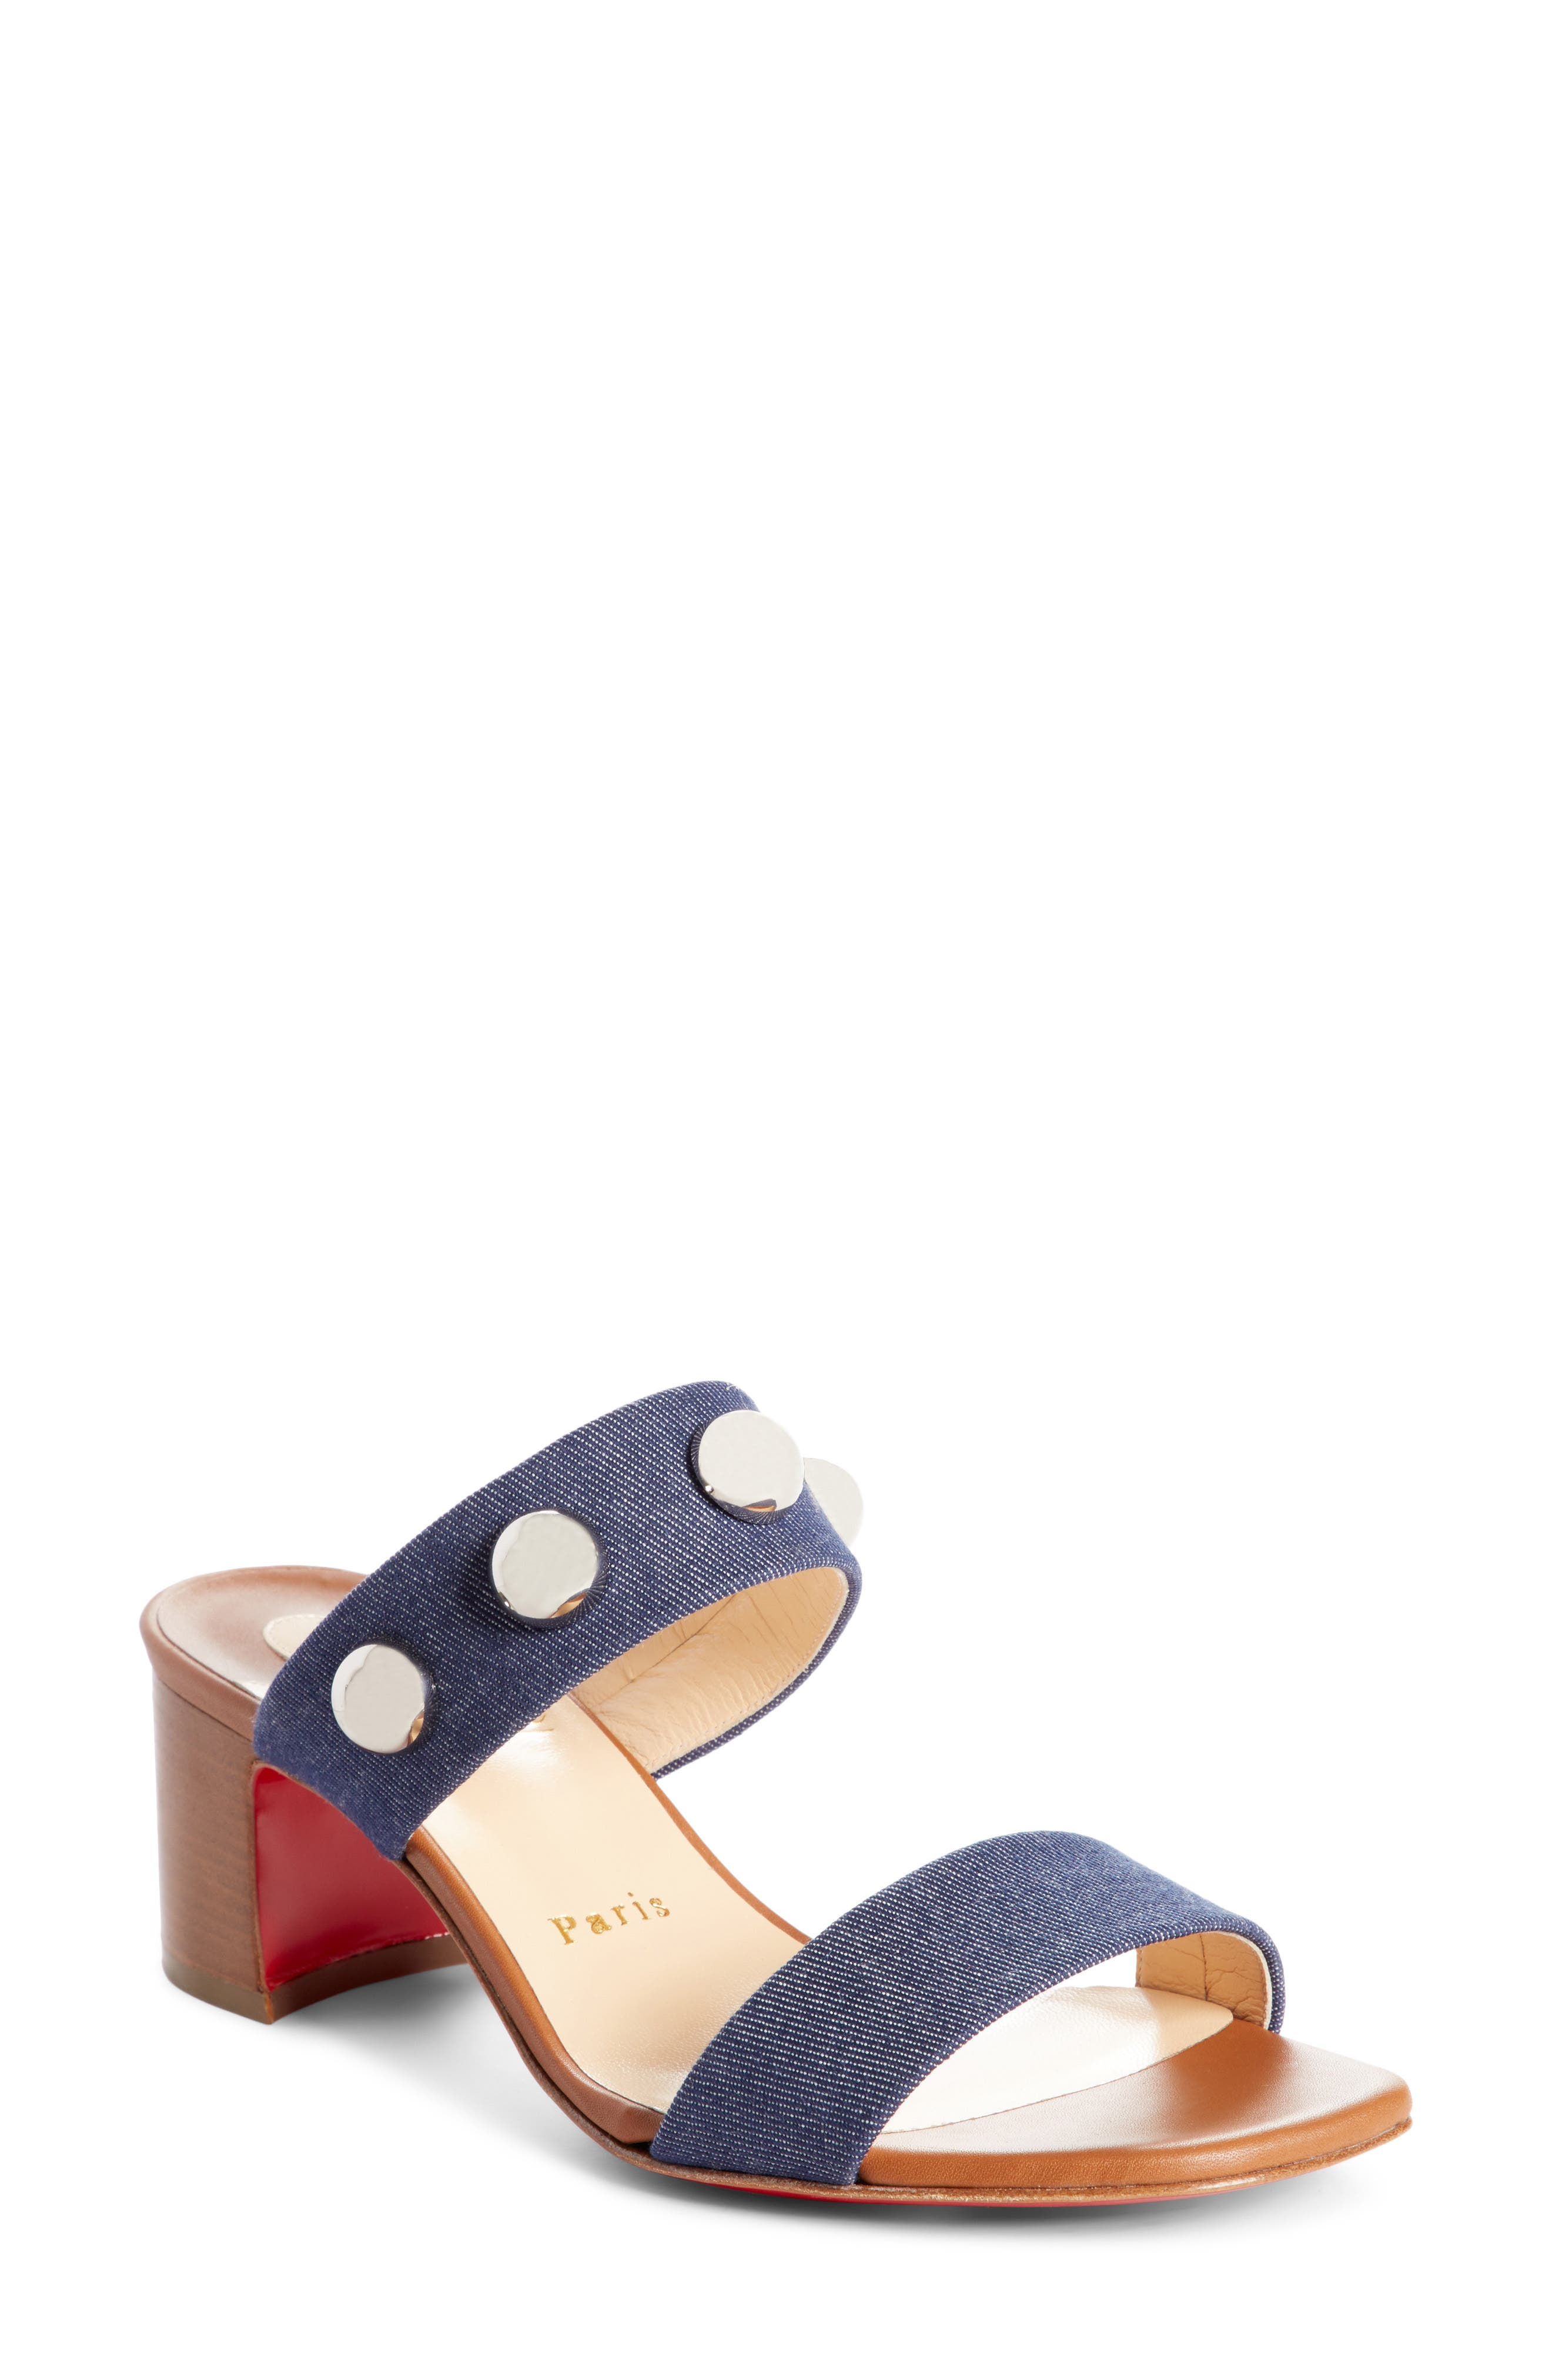 Christian Louboutin Simple Bille Ornament Slide Sandal